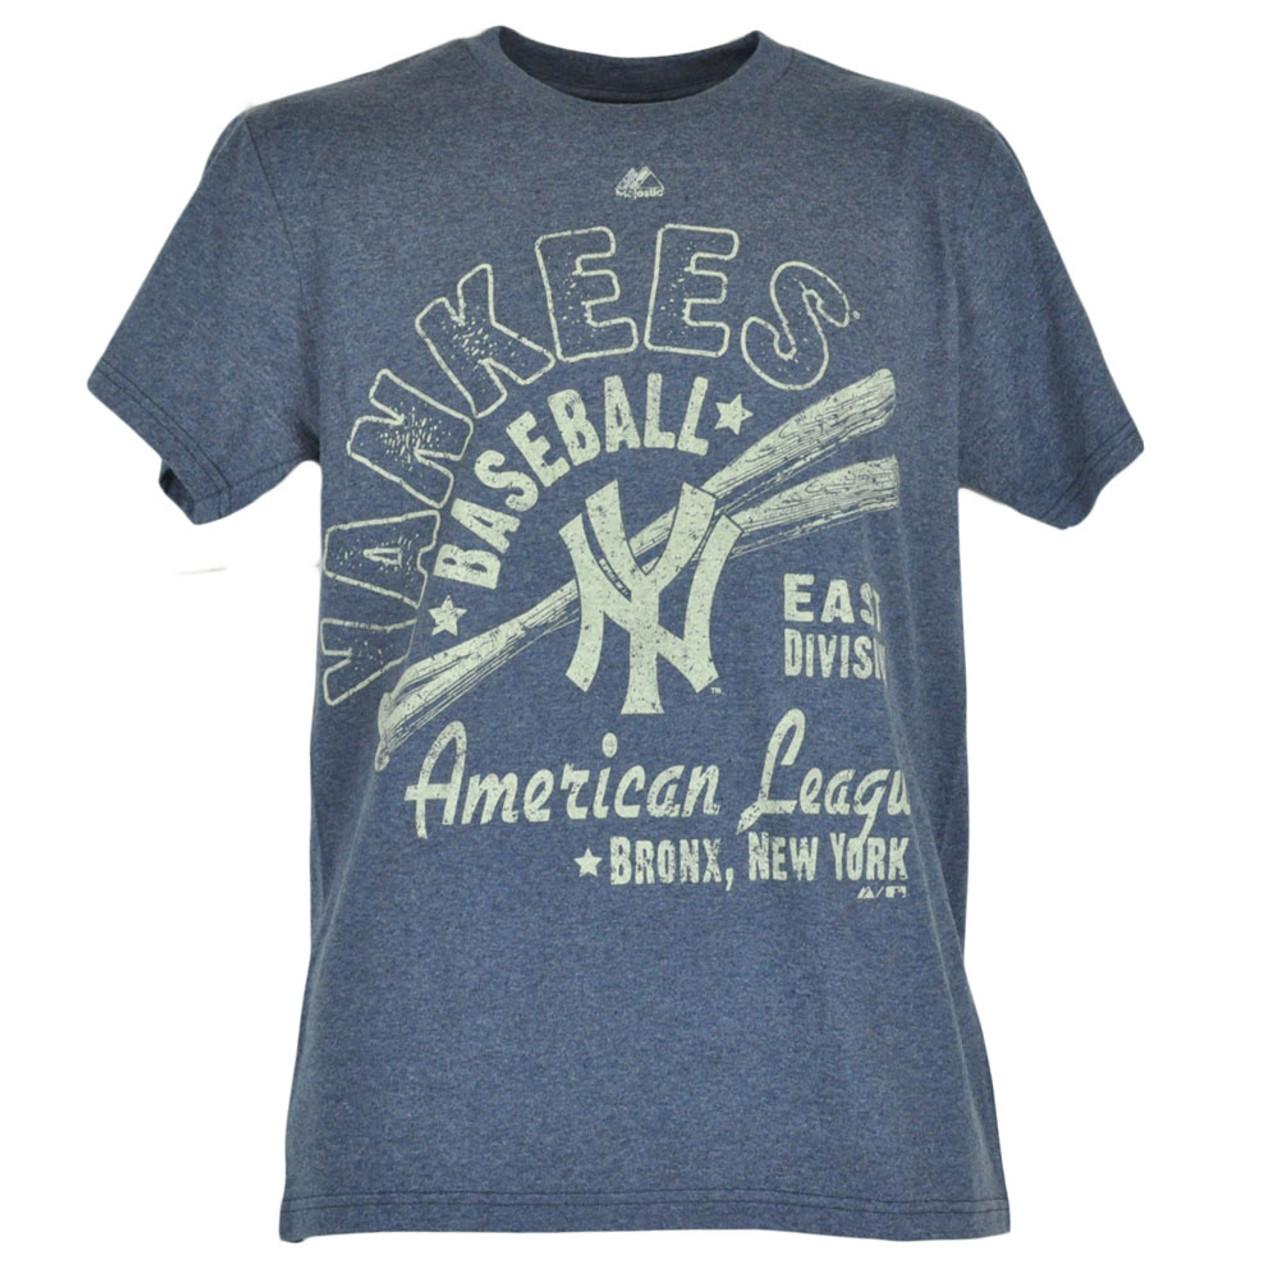 5c7c49e24b6 MLB Majestic New York Yankees Triblend Distressed Tshirt Mens Hot Stove  League - Cap Store Online.com